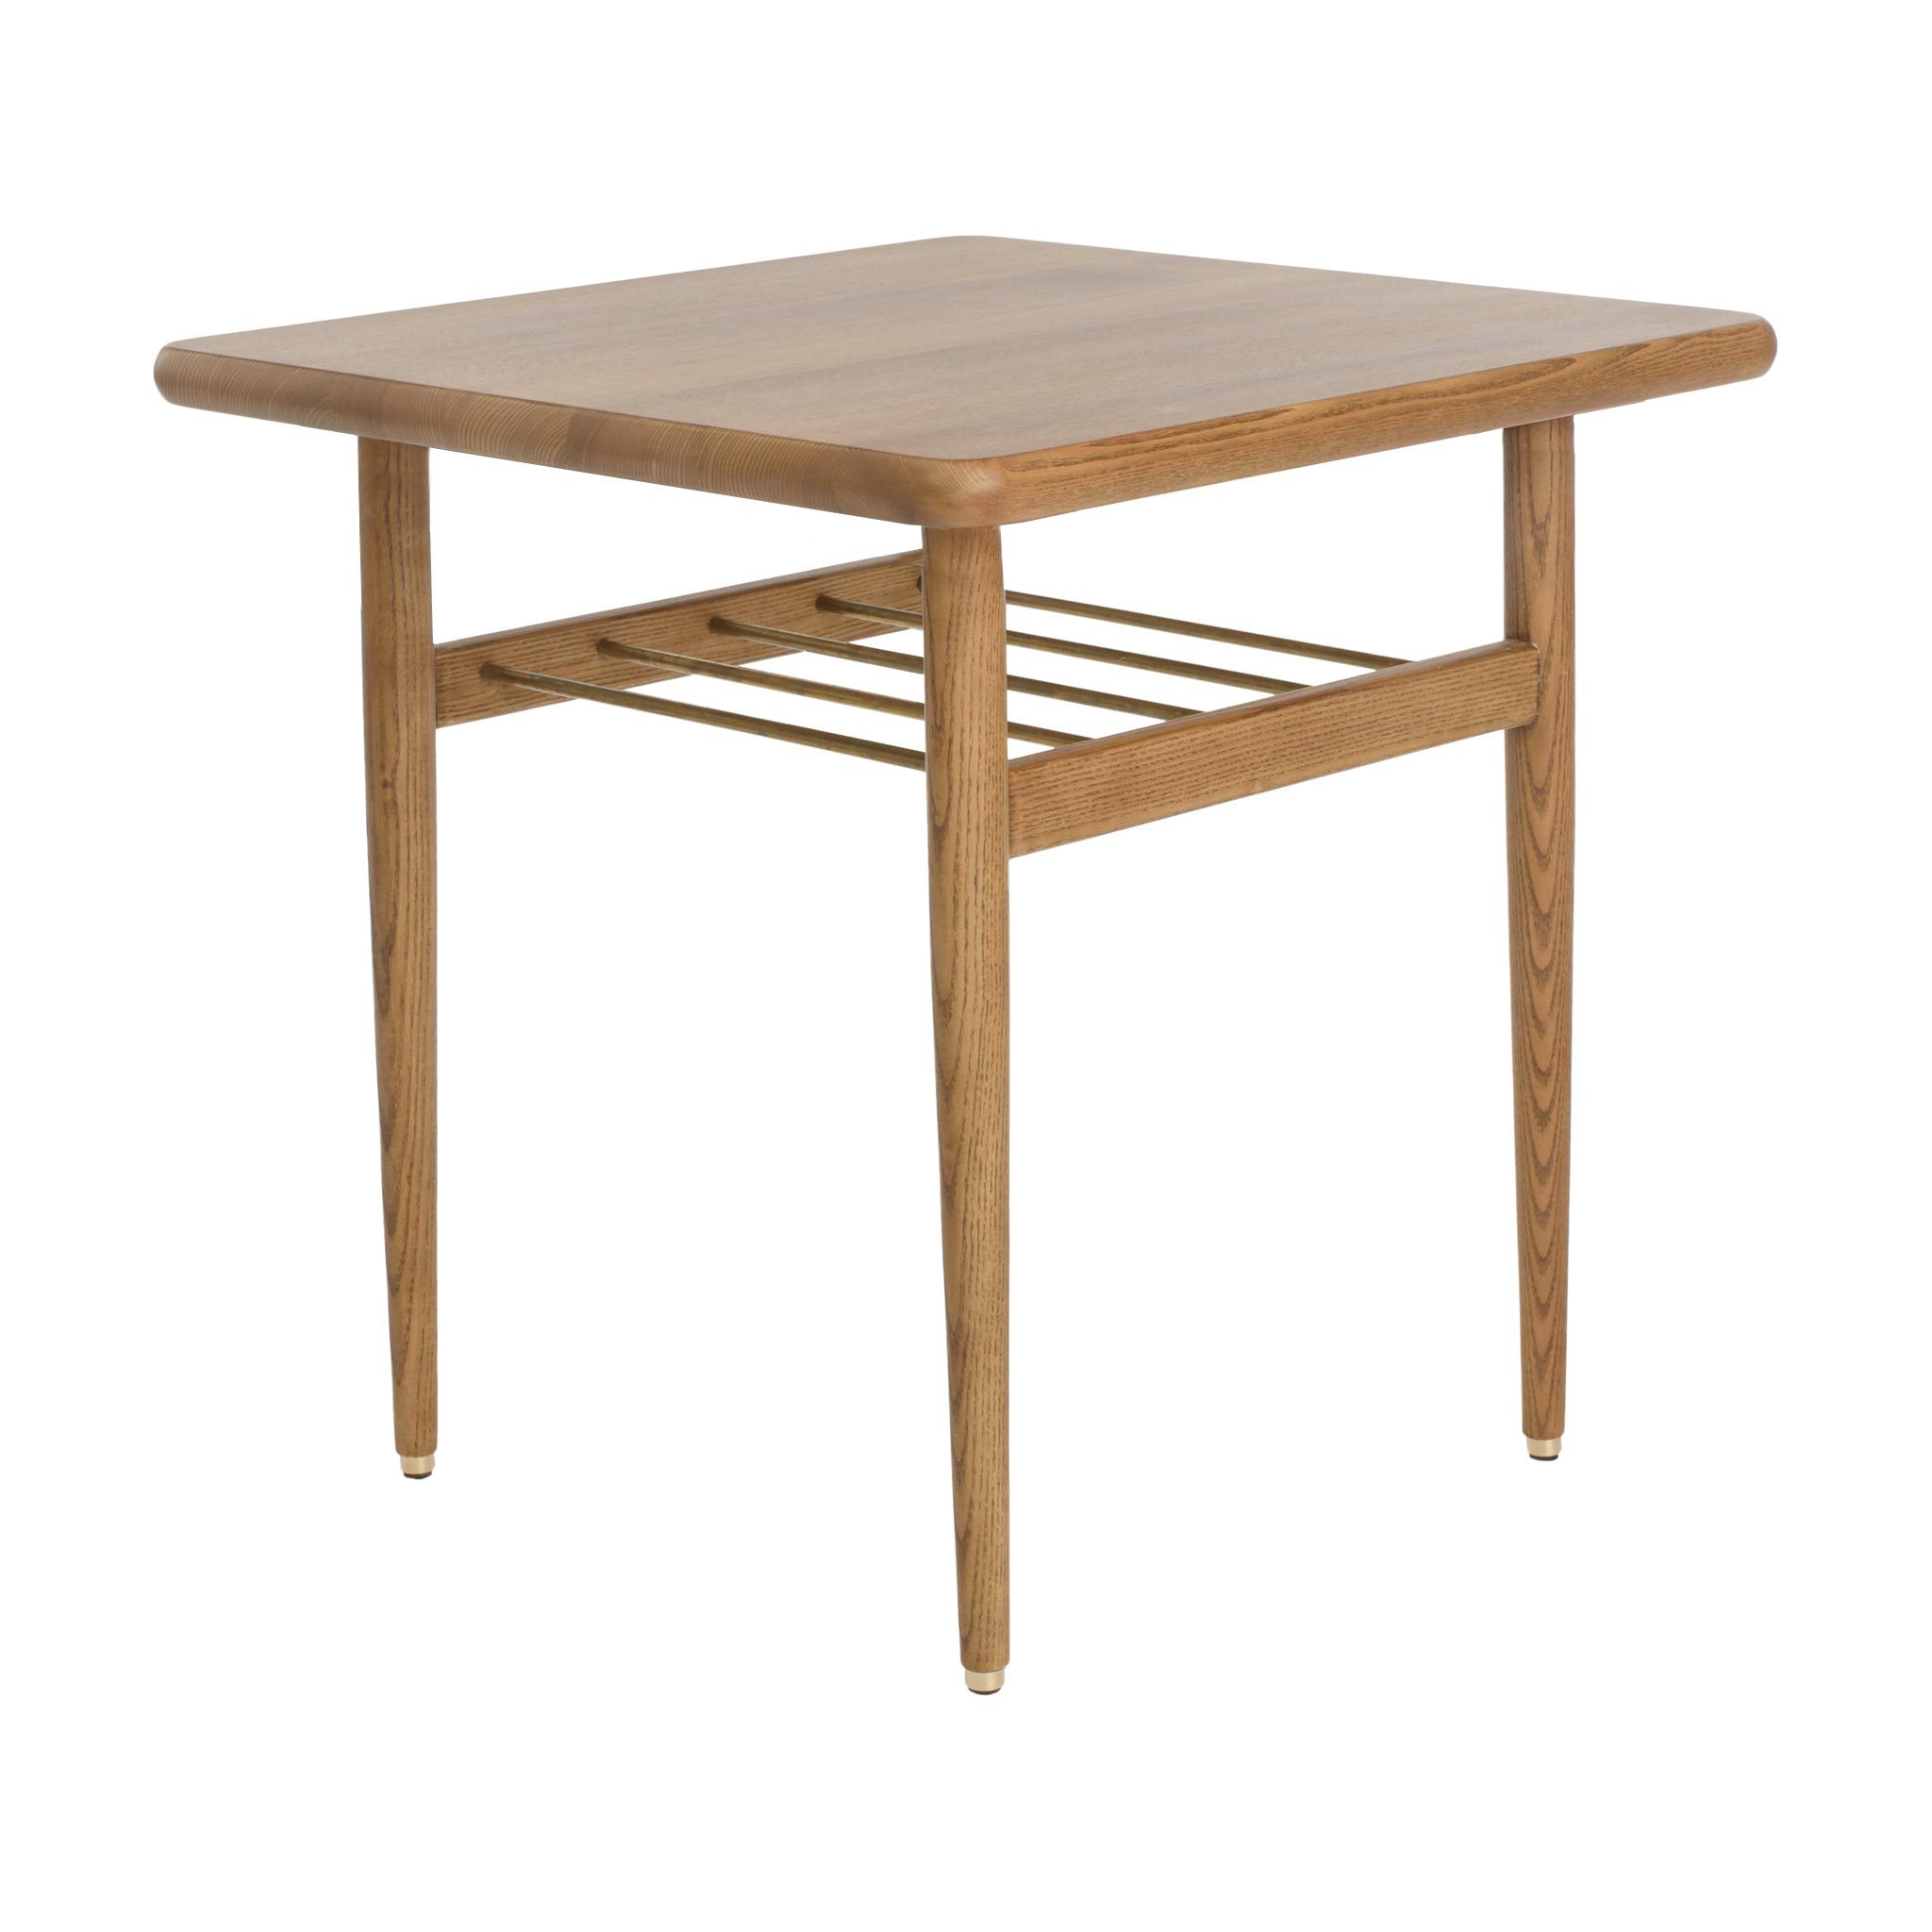 tables, interior-design, furniture, FOX SQUARE COFFEE TABLE - 366Concetp fox square coffee table W03